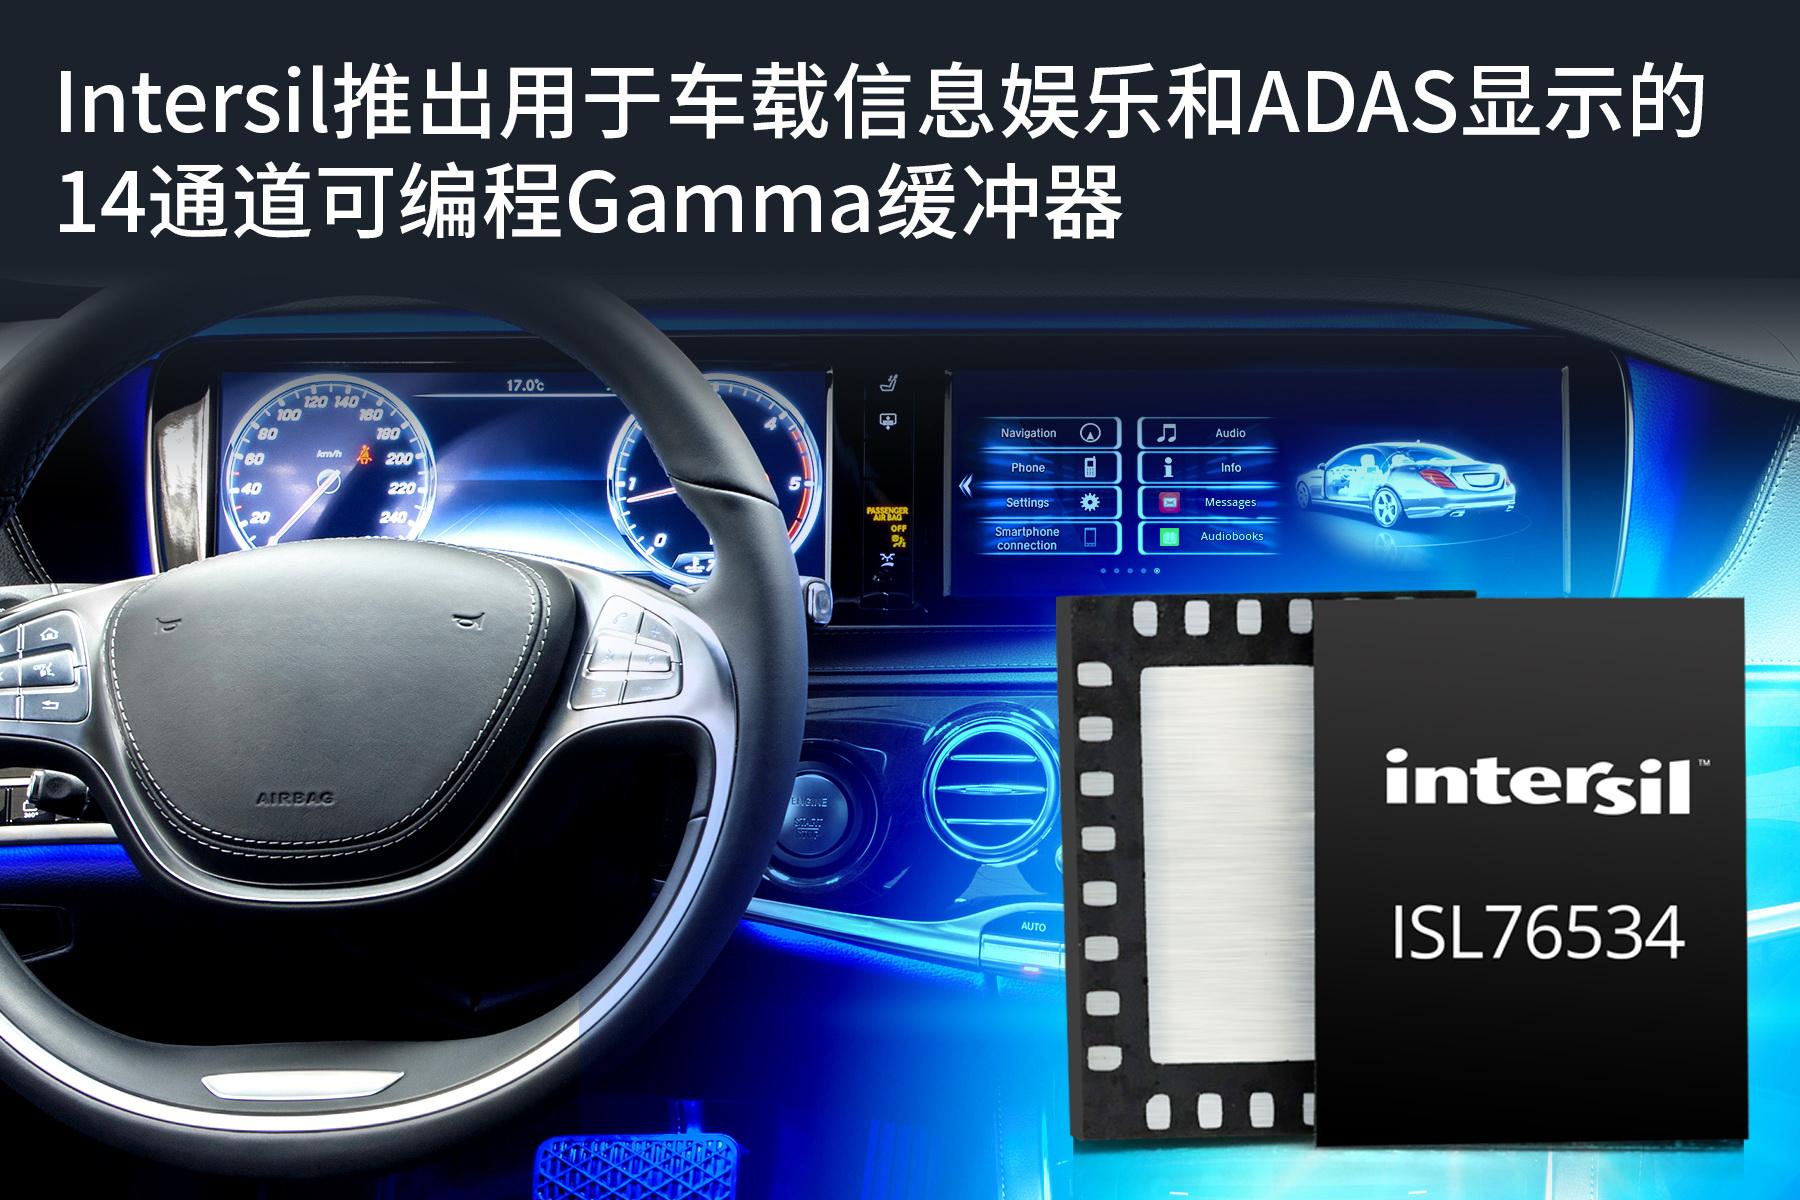 Intersil推出用于车载信息娱乐和ADAS显示的14通道可编程Gamma缓冲器